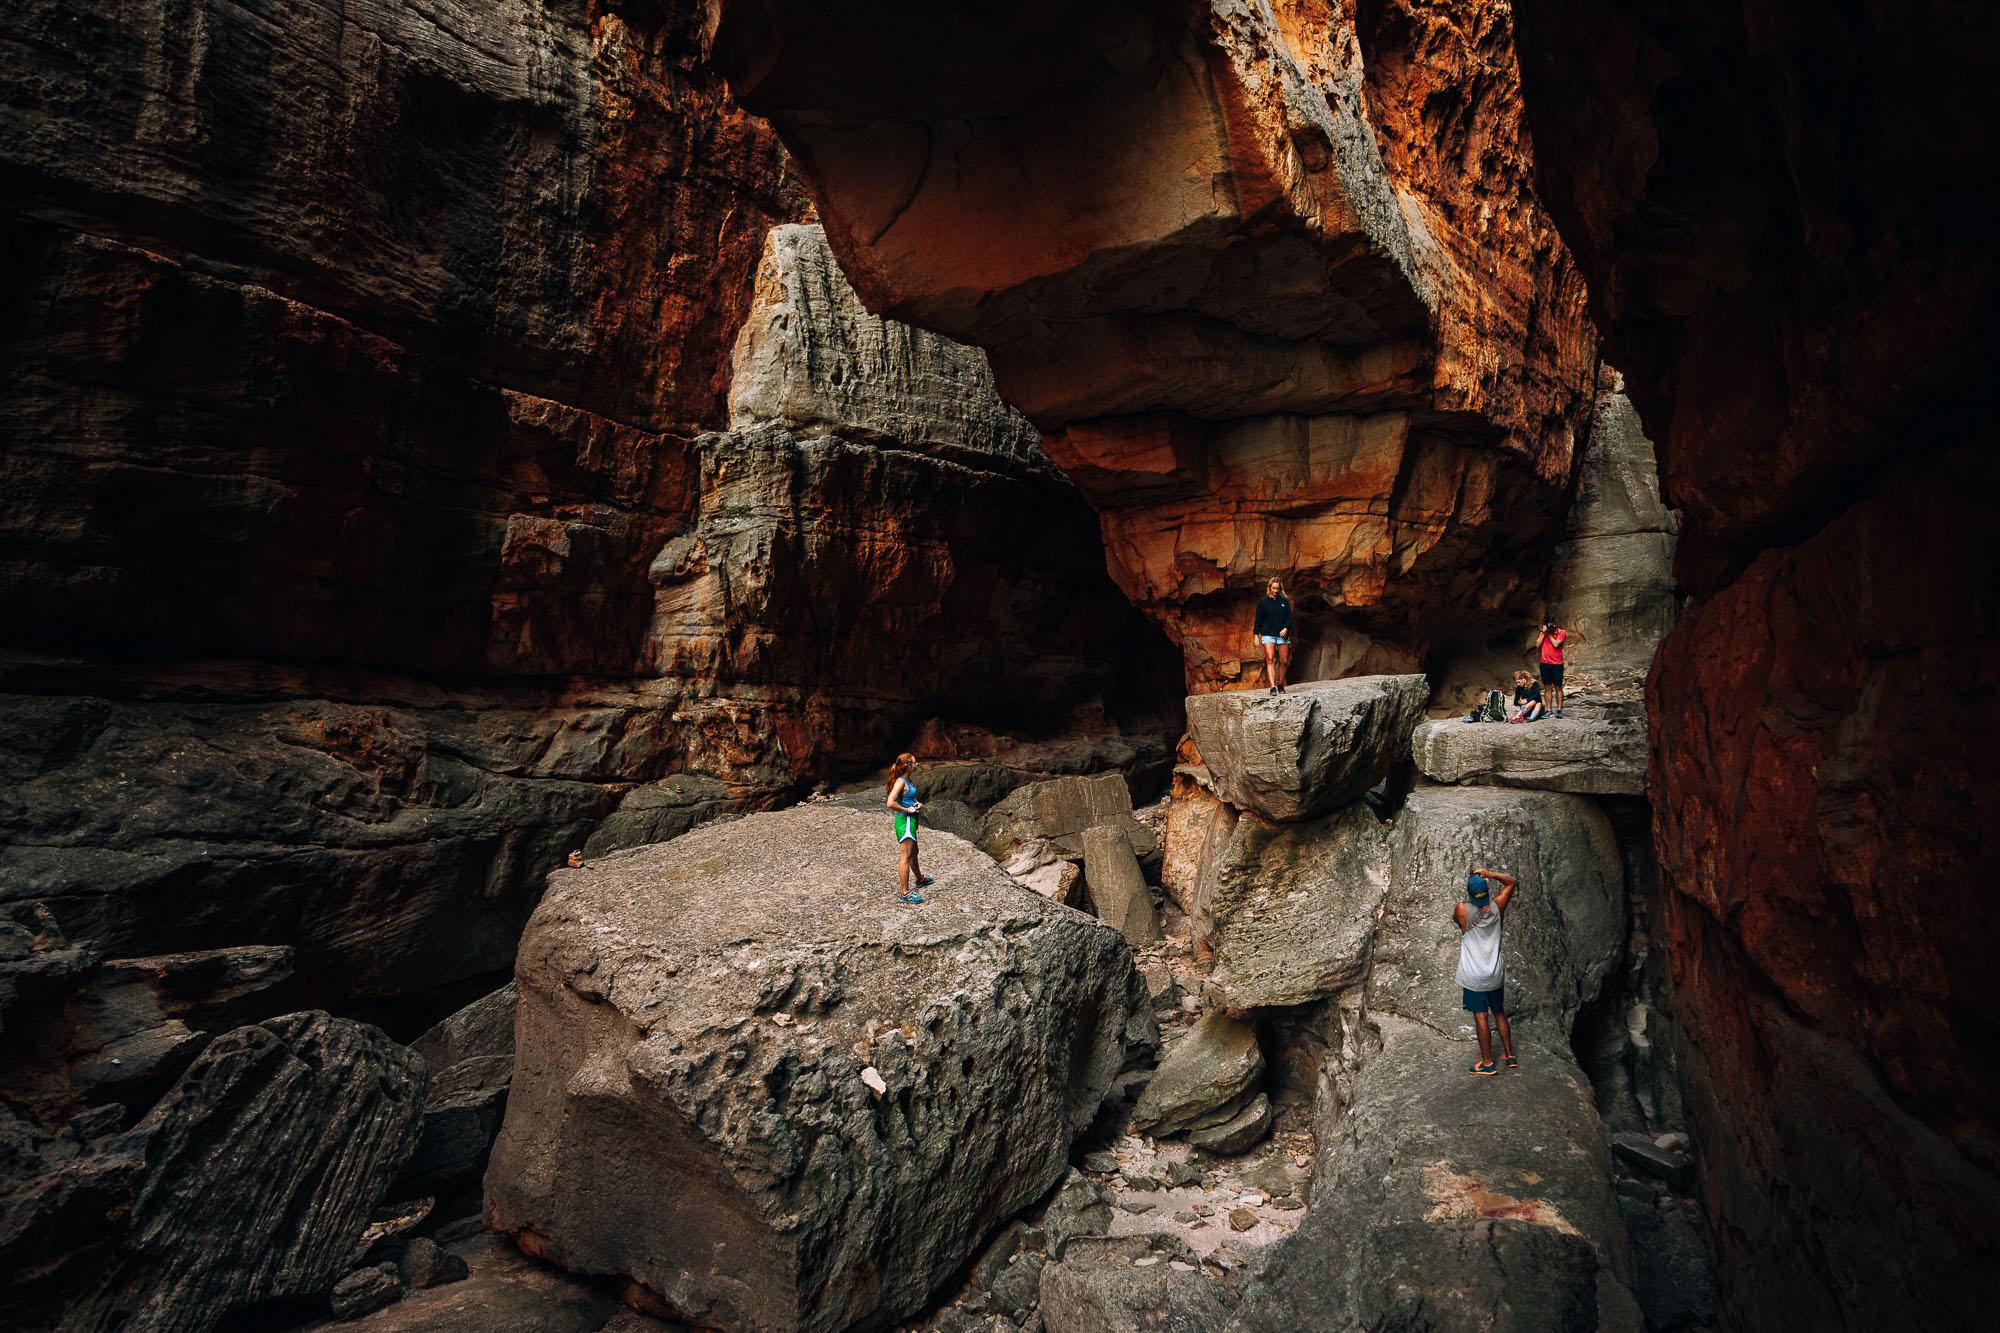 Wolfberg Cracks, South Africa